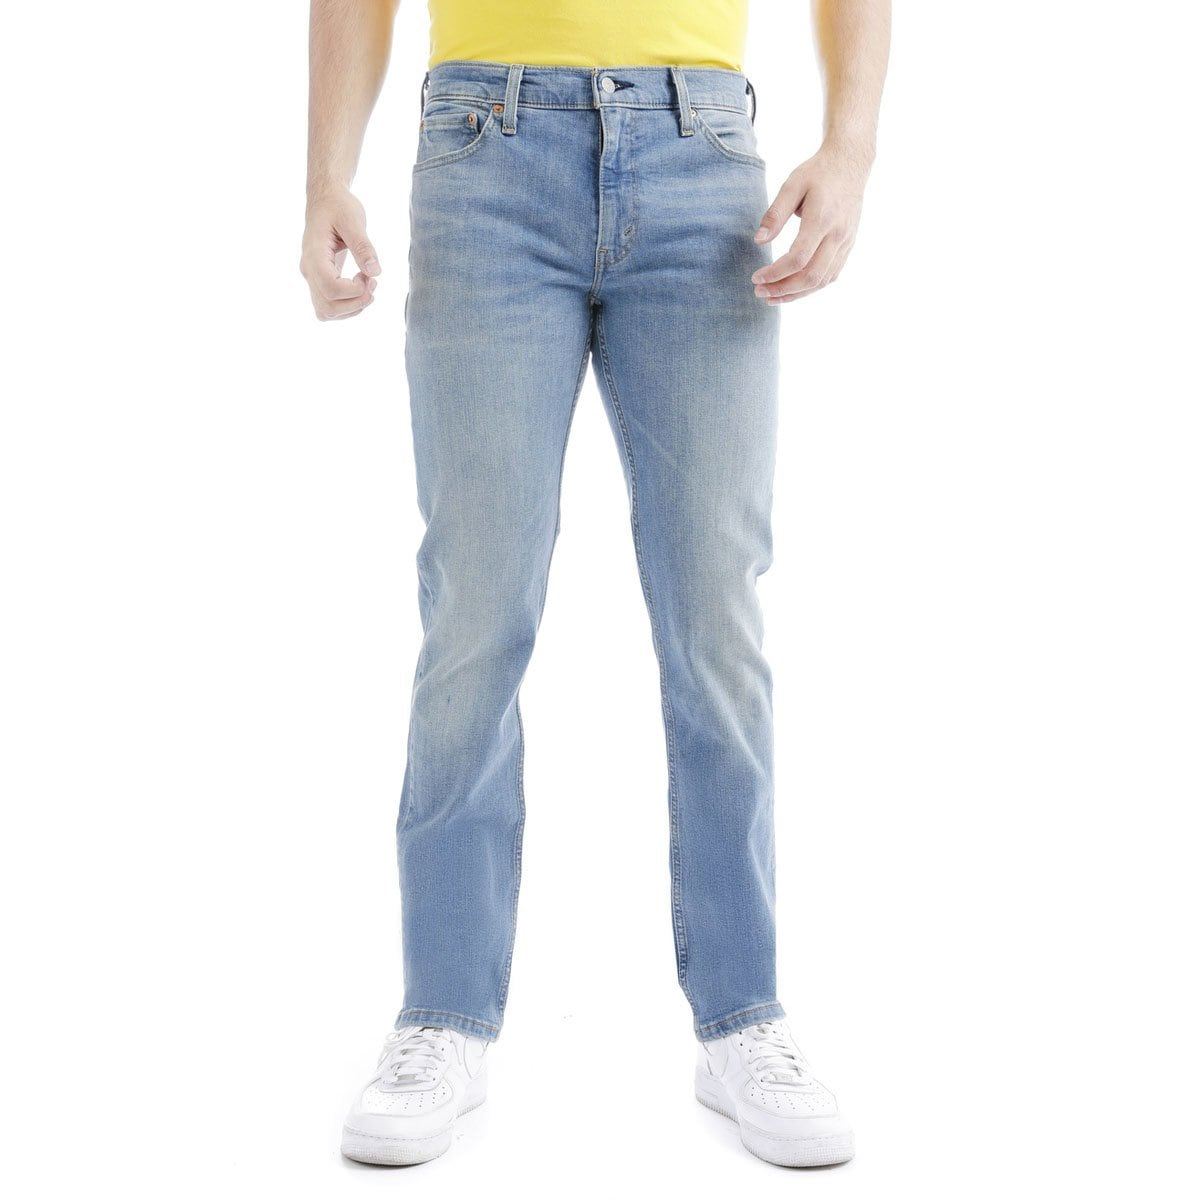 Pantalon Slim Corte A La Cadera Levi S Para Caballero